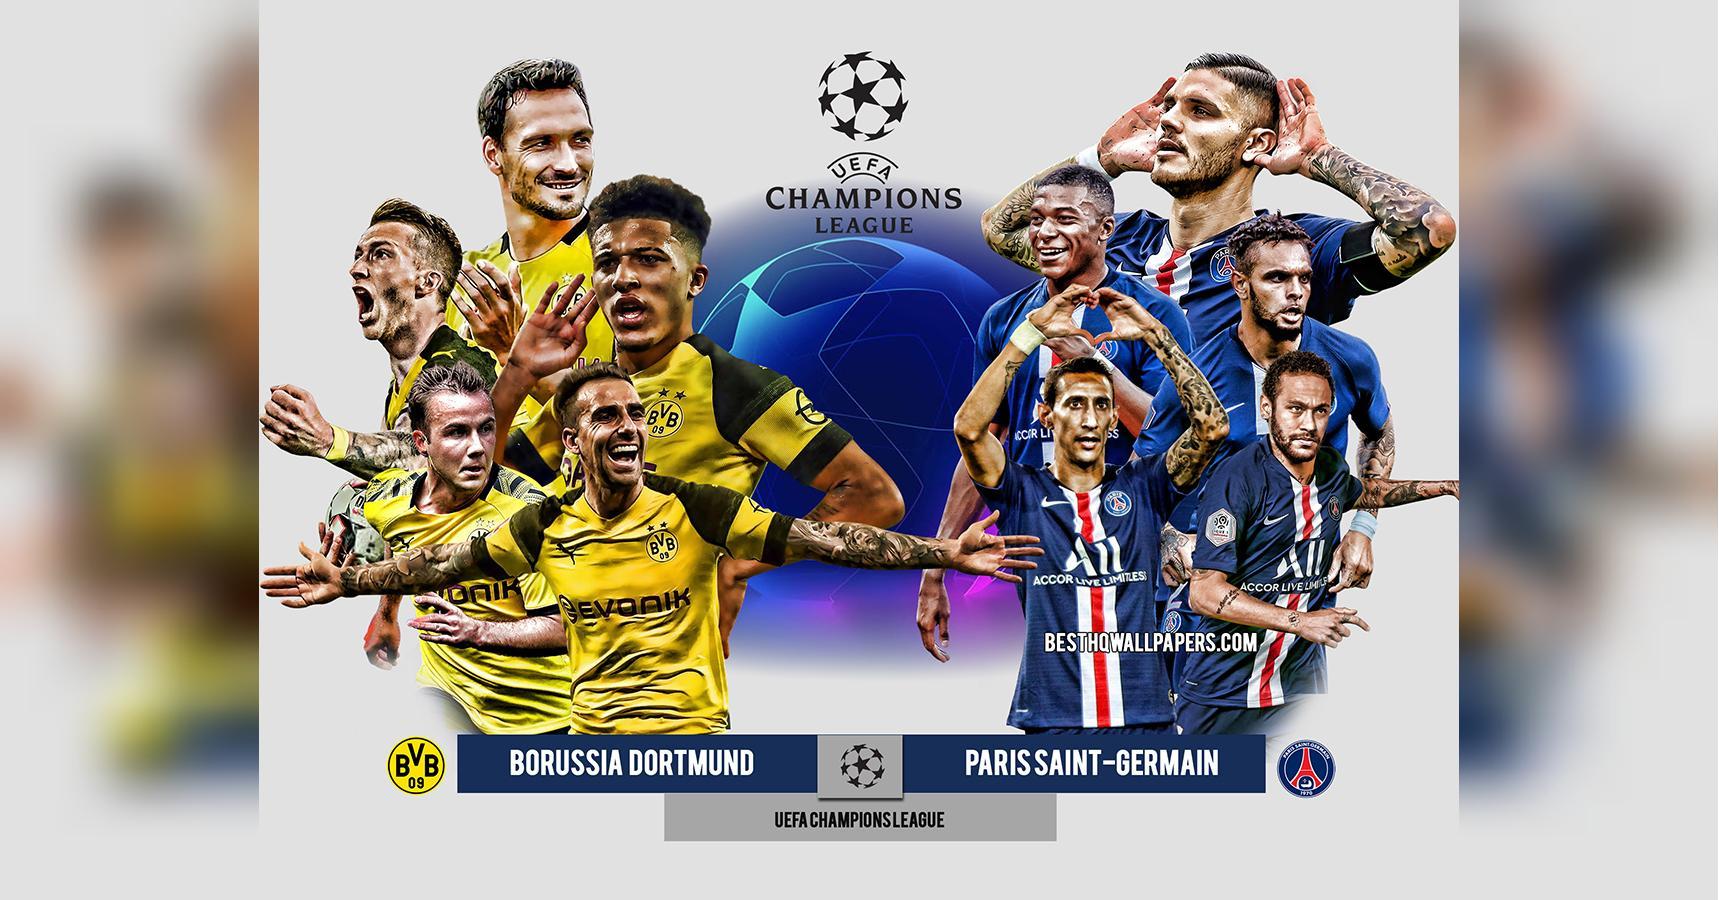 Бавария боруссия дортмунд финал лиги чемпионов смотреть онлайн